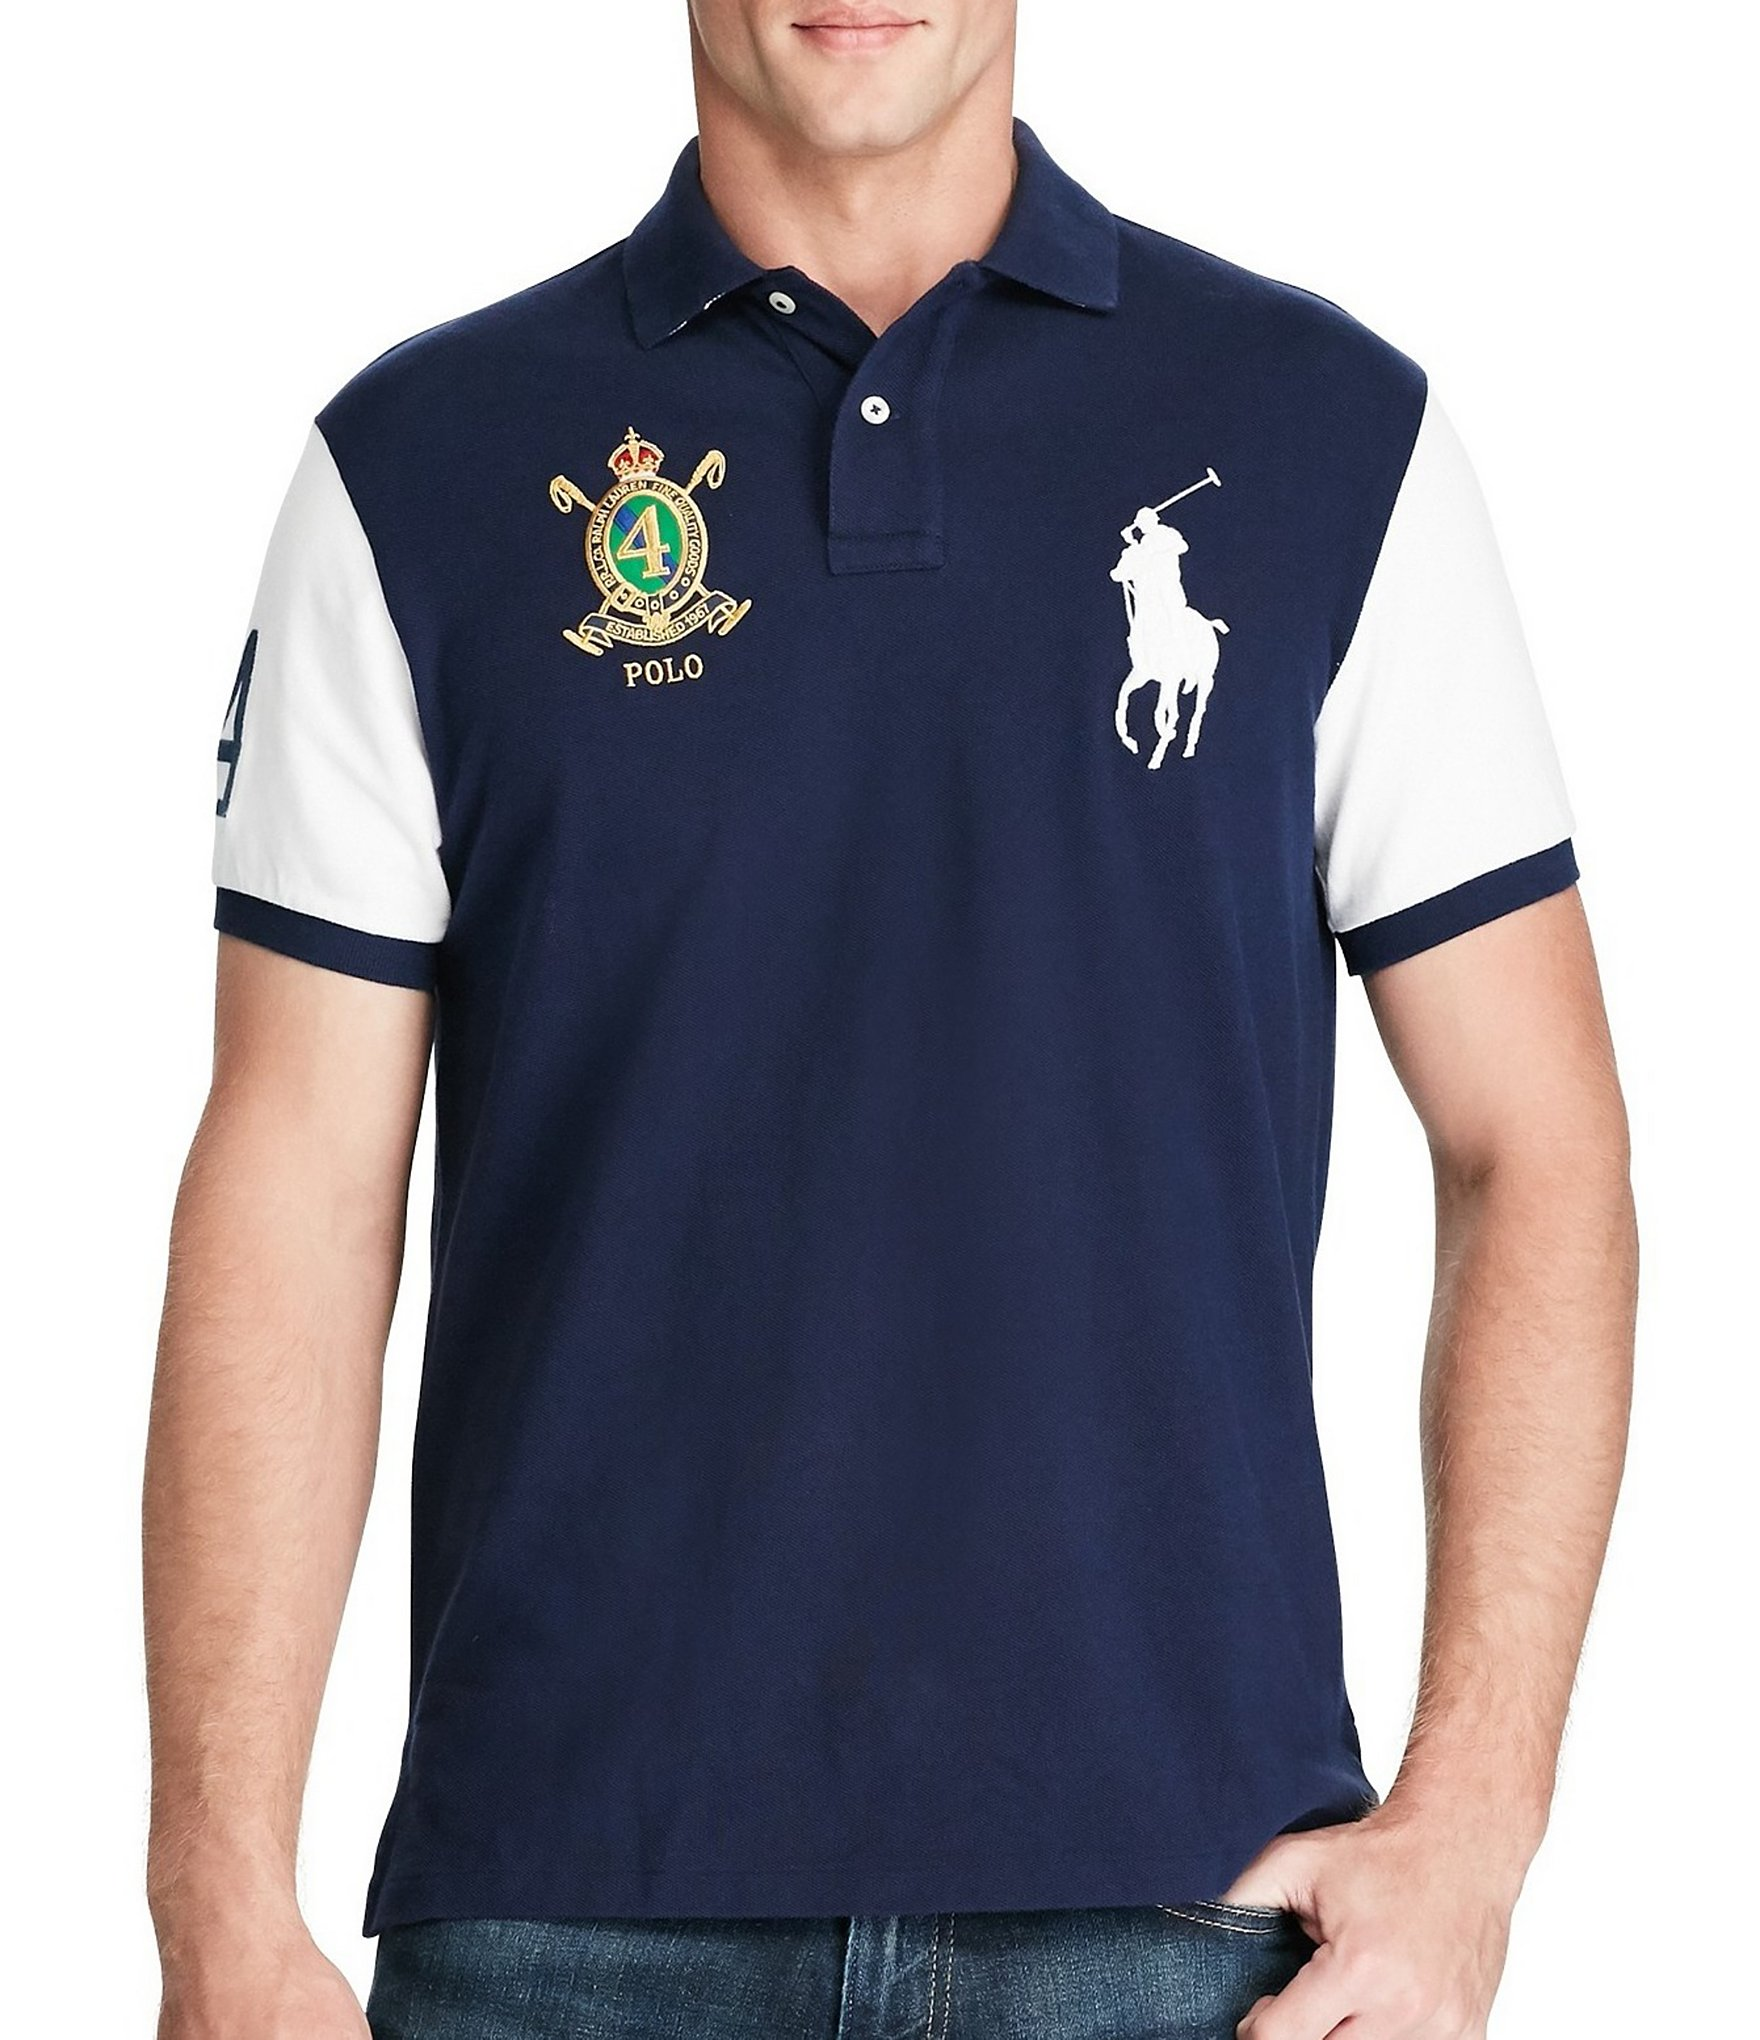 men | shirts | polo shirts | dillards.com iaxmlvy